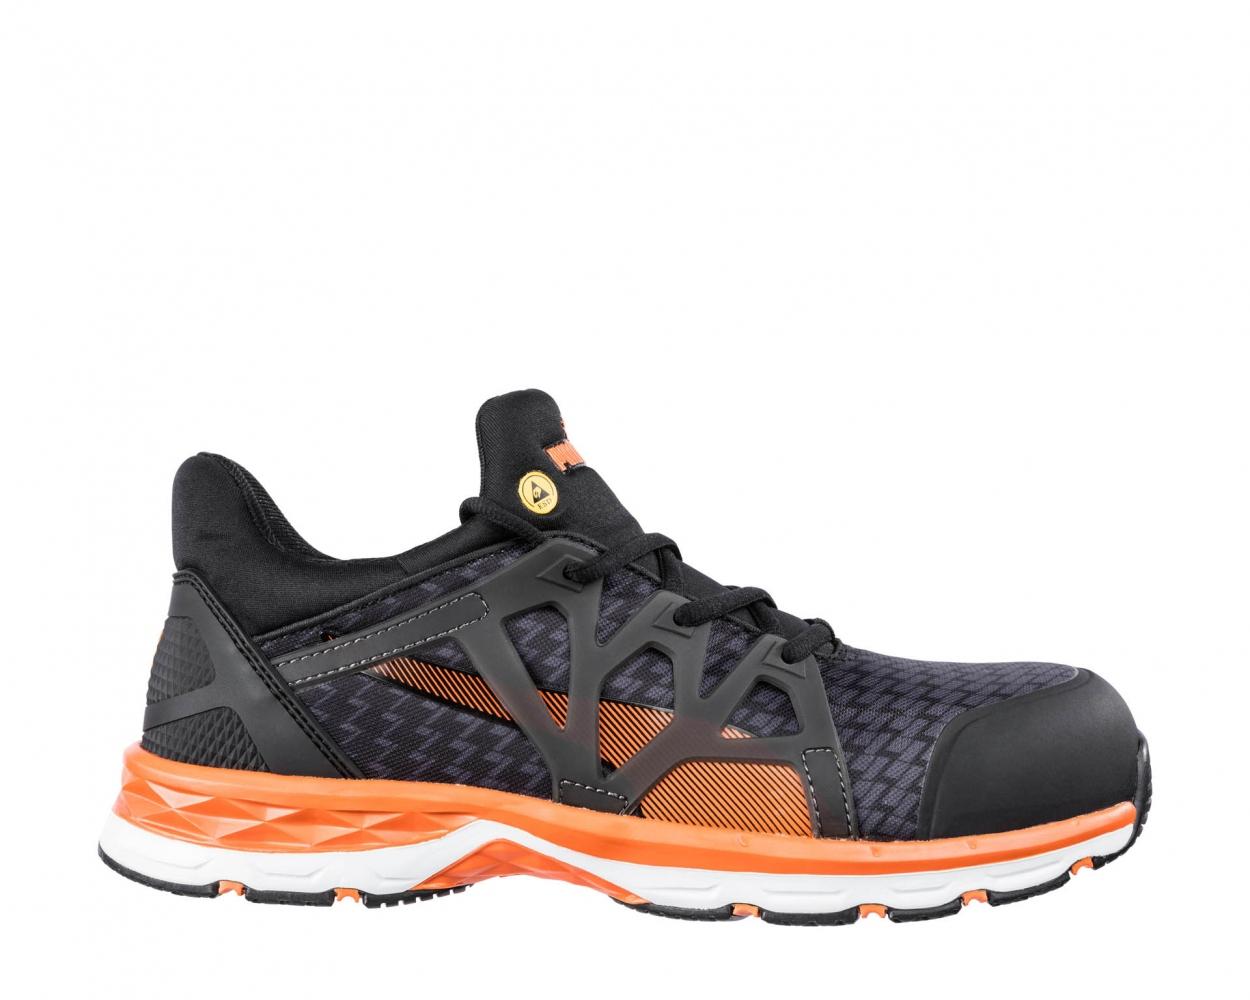 6b1a2d36c8b4 PUMA 633870 RUSH 2.0 MID safety shoes S1P ESD HRO SRC - online ...